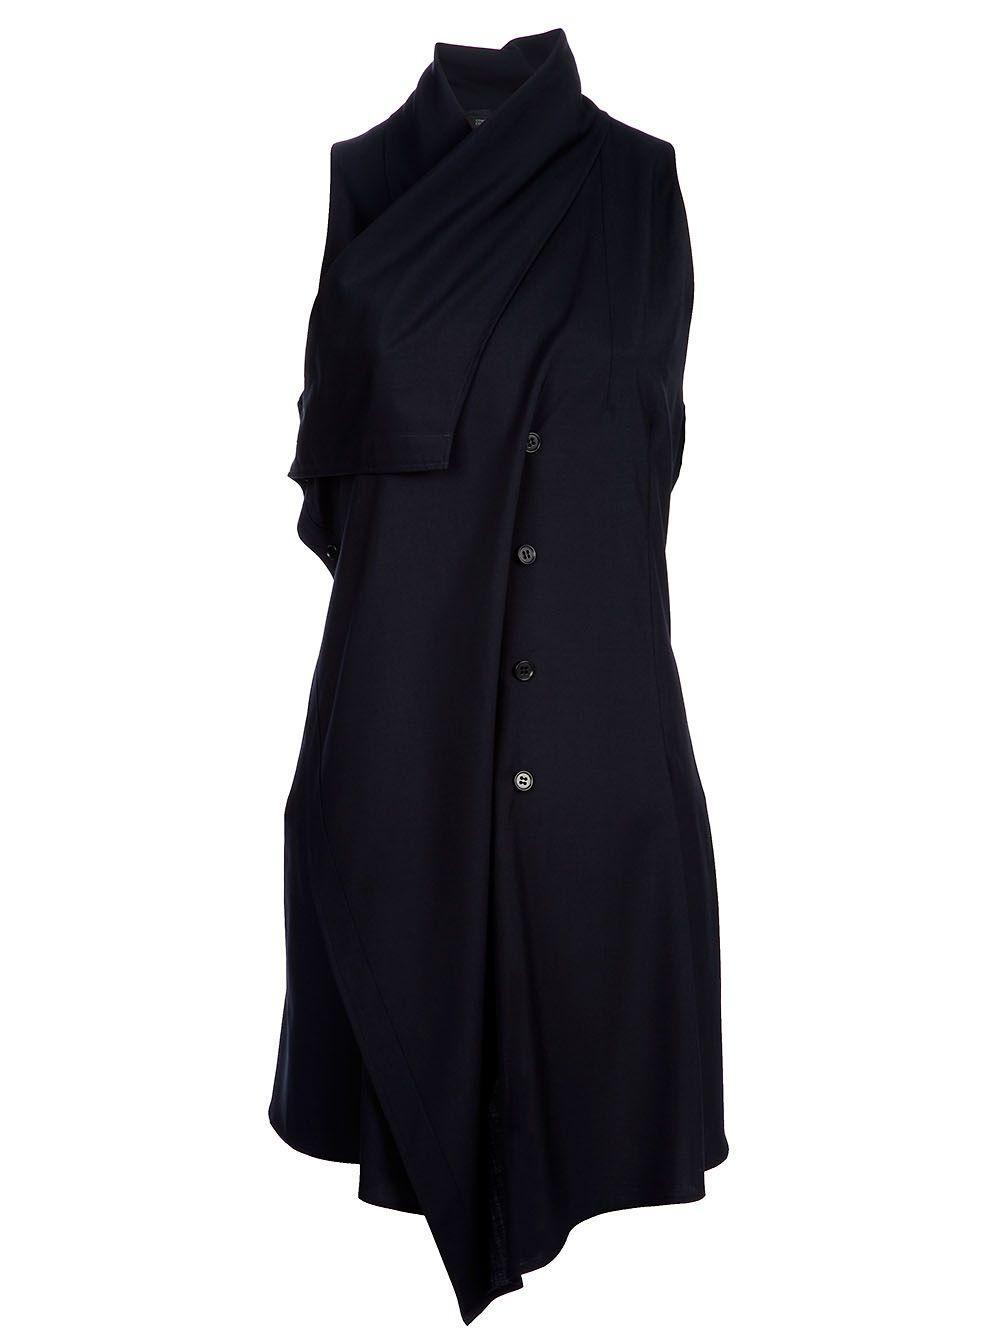 Yohji Yamamoto Sleeveless Wool Top